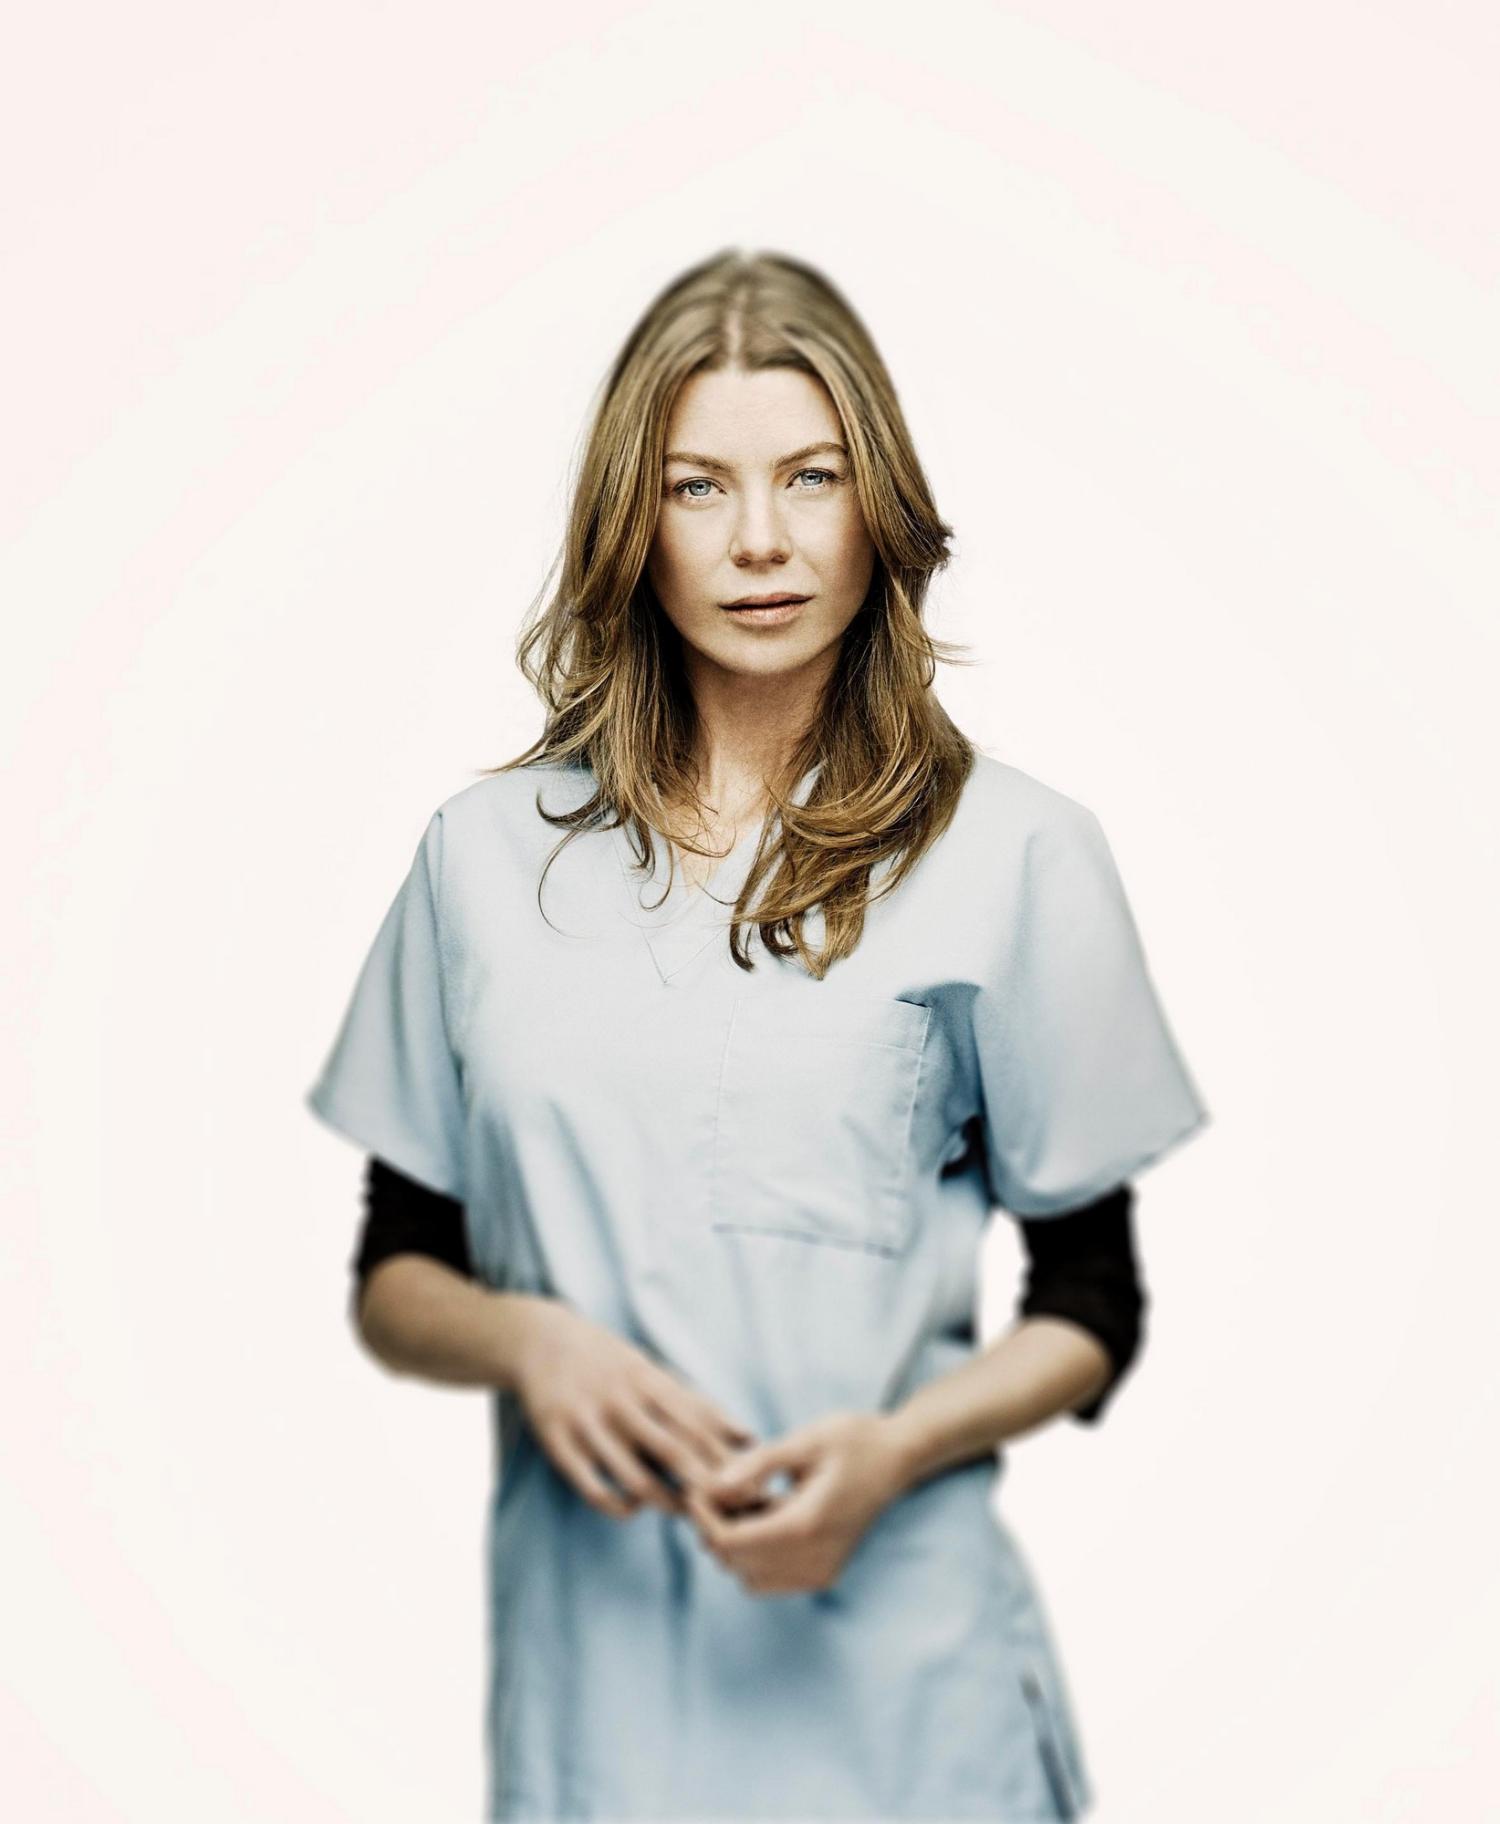 Beste Greys Anatomy S05e01 Fotos Anatomie Ideen Finottifo